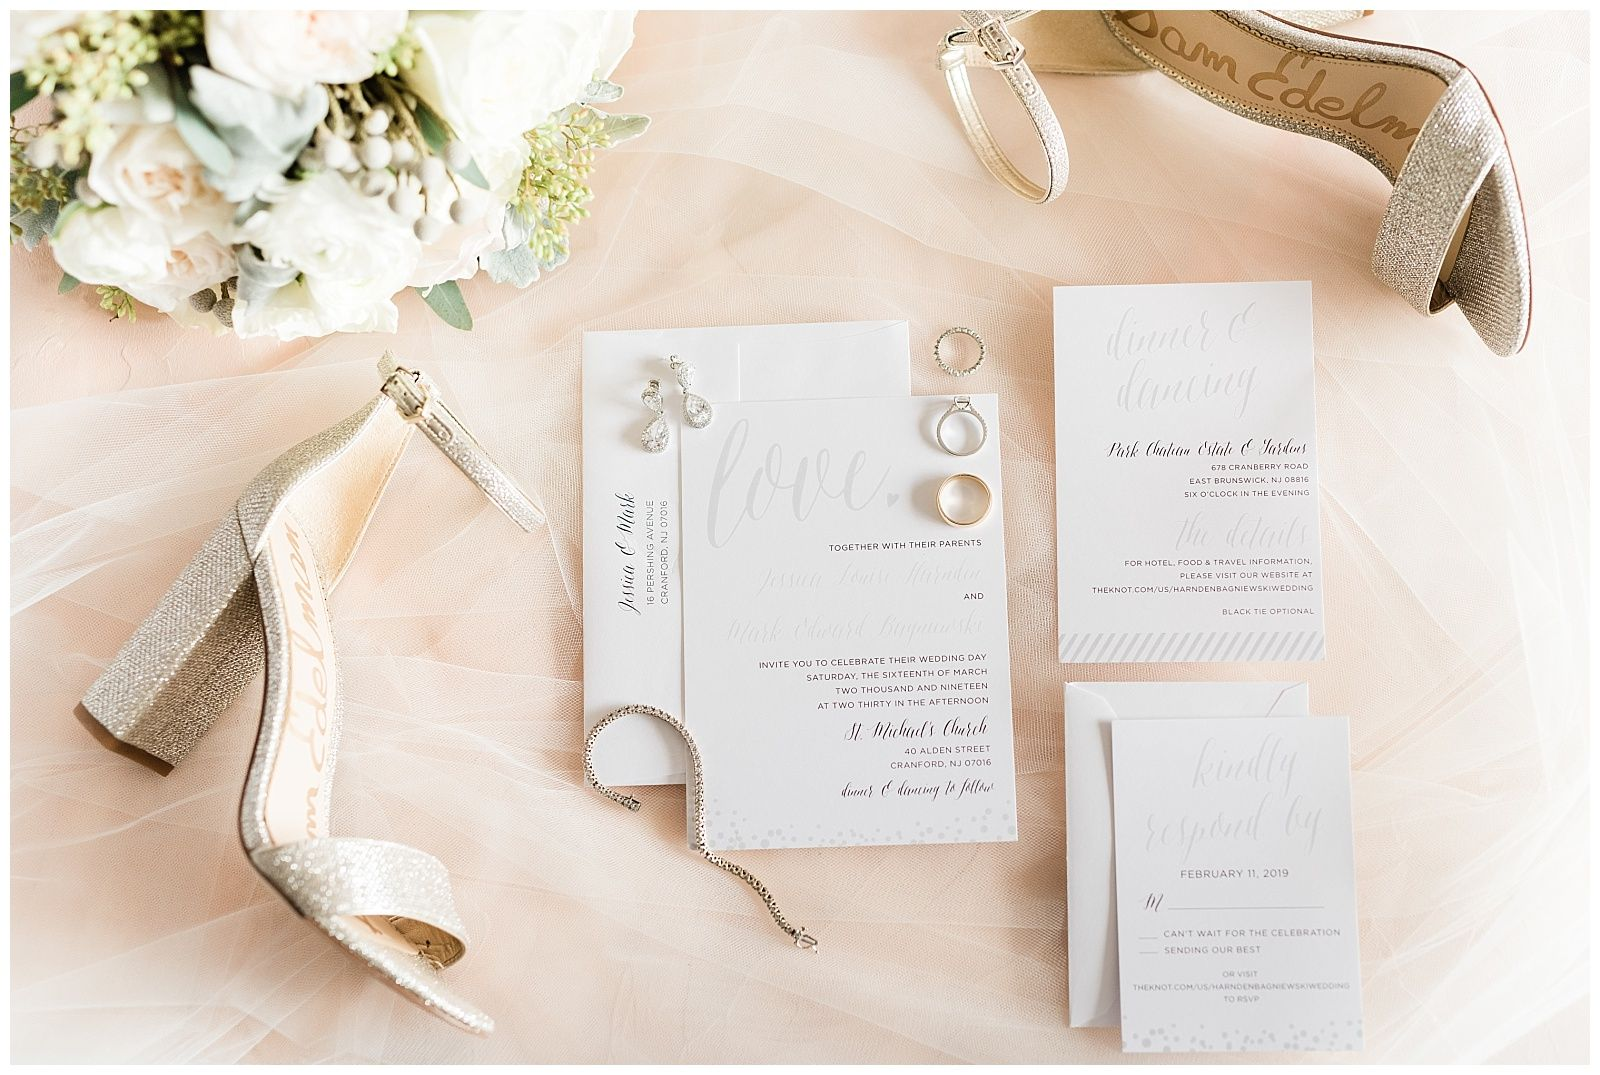 Park Chateau Wedding East Brunswick Nj Jessica Mark Jenniferlarsenphoto Com Chateau Wedding Bridal Invitations Wedding Classic